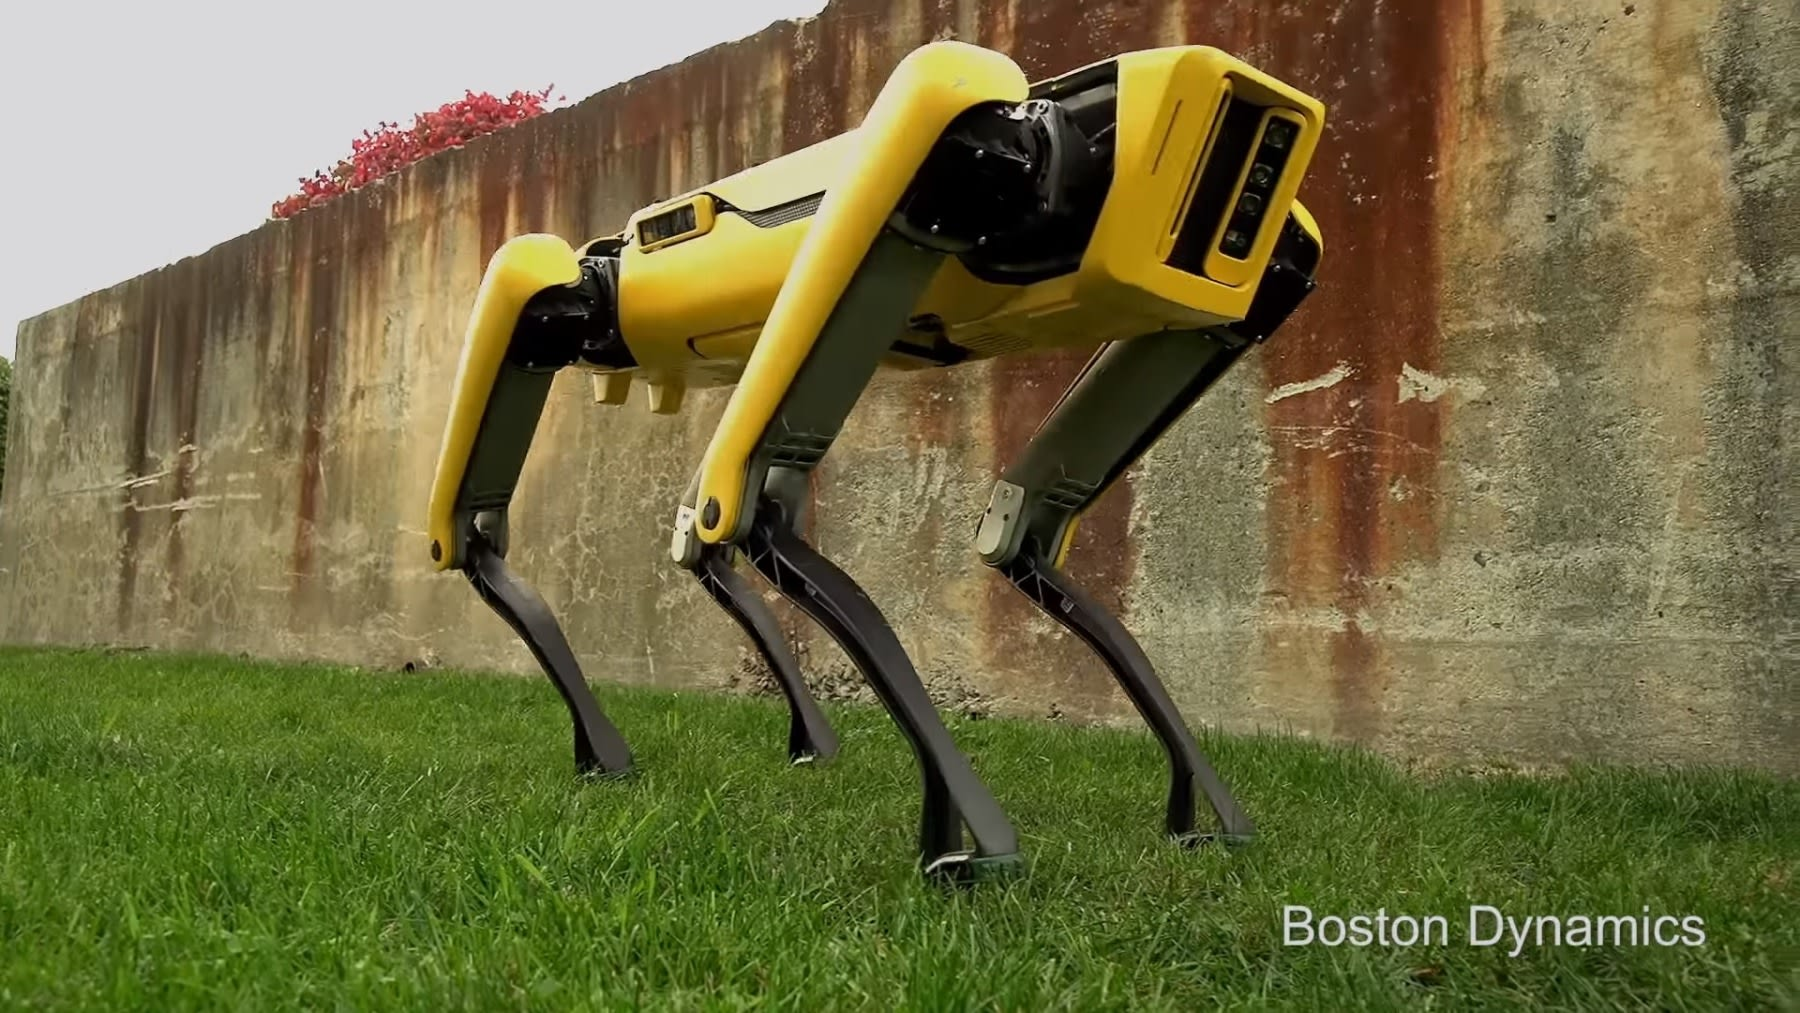 Boston Dynamics New Spotmini Robot Looks Ready For A Walk